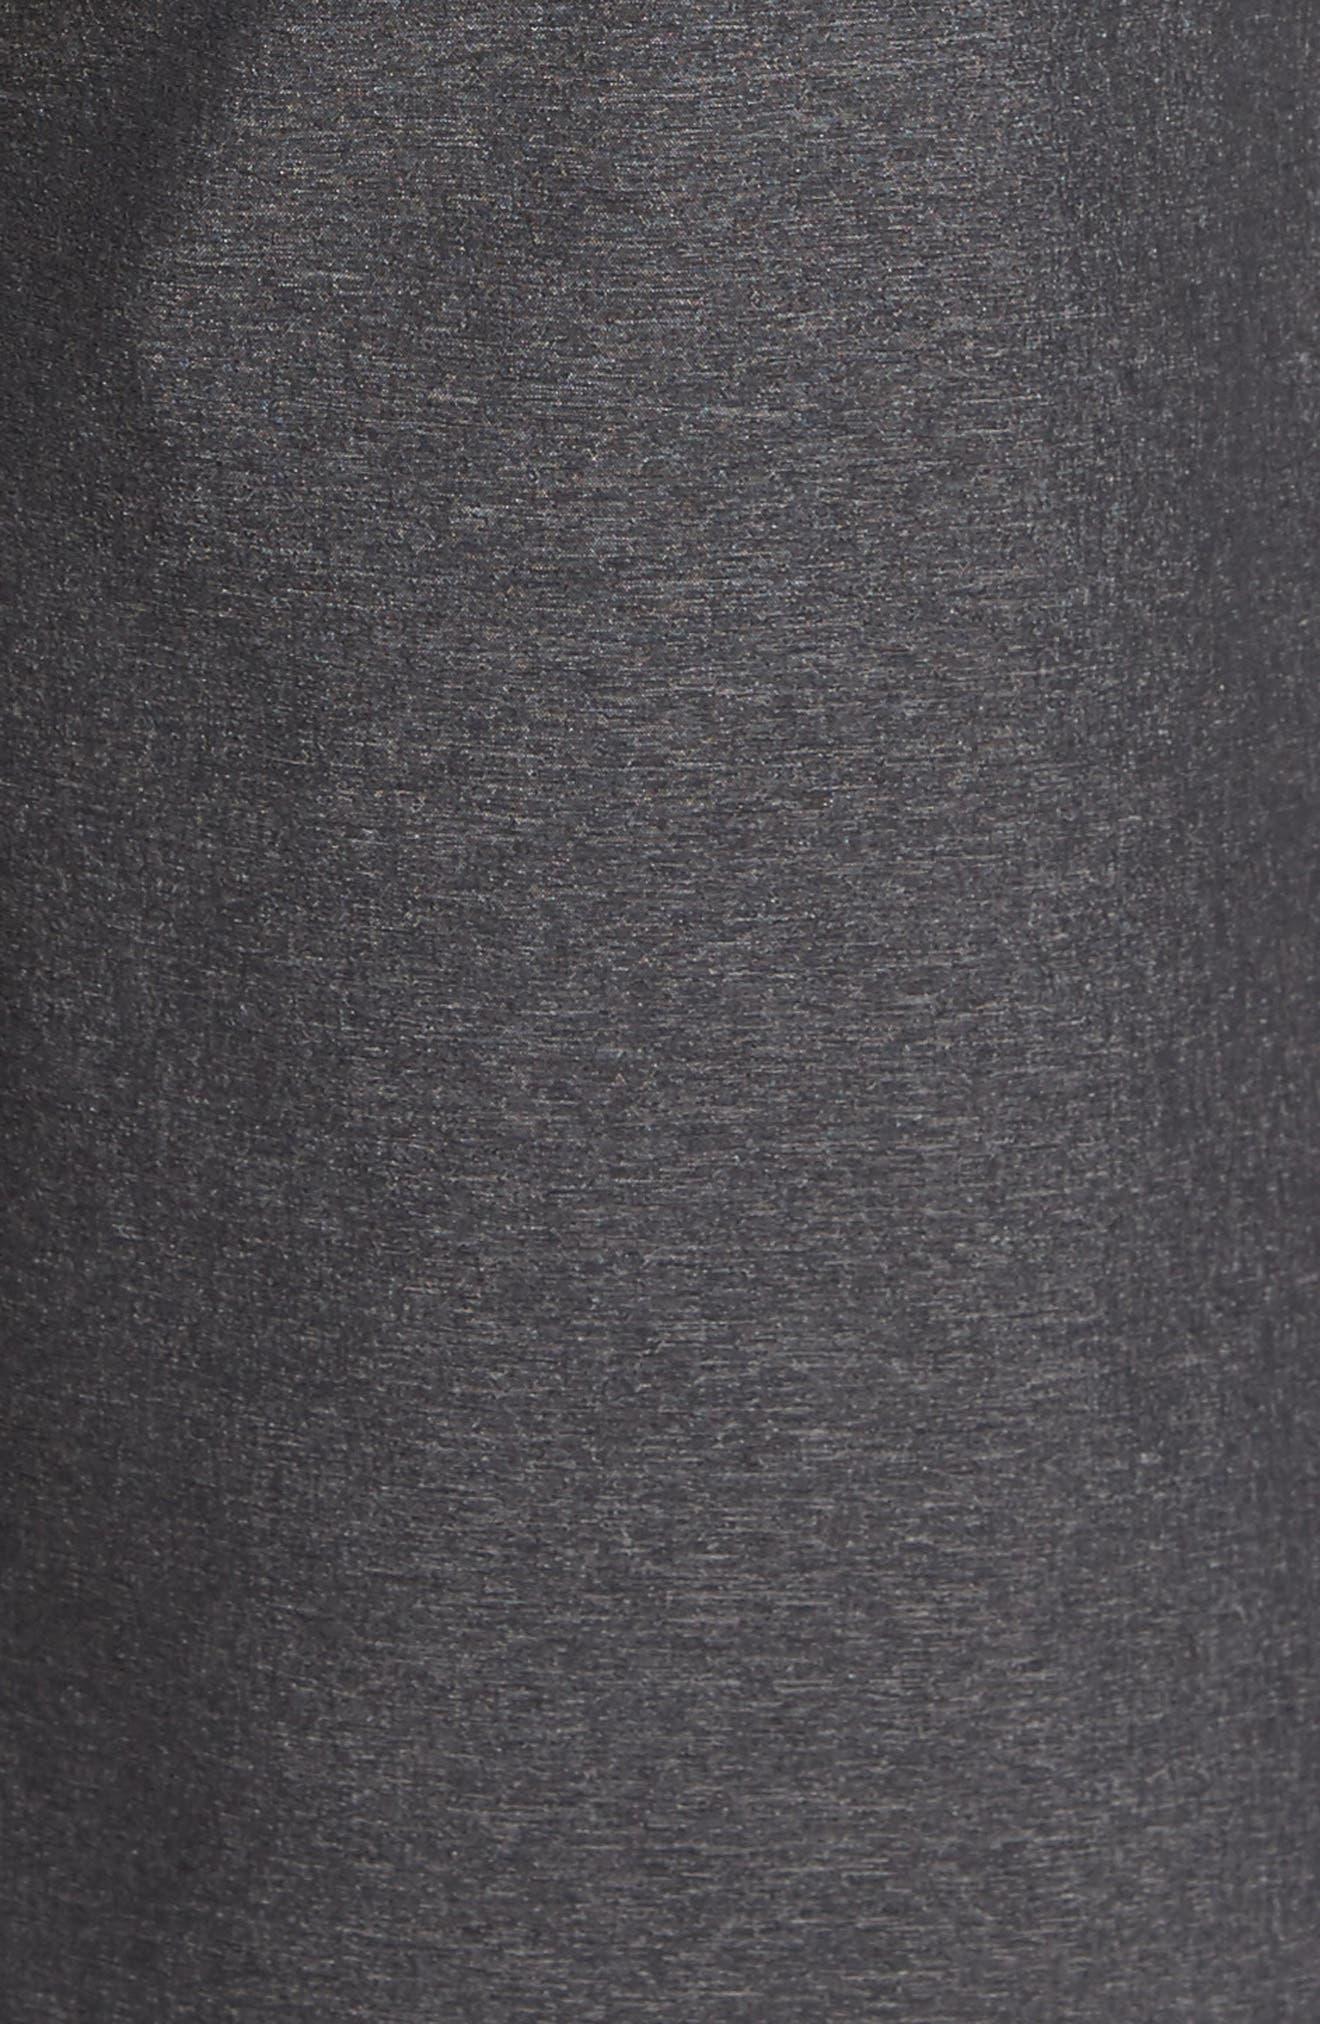 Graphite Shorts,                             Alternate thumbnail 5, color,